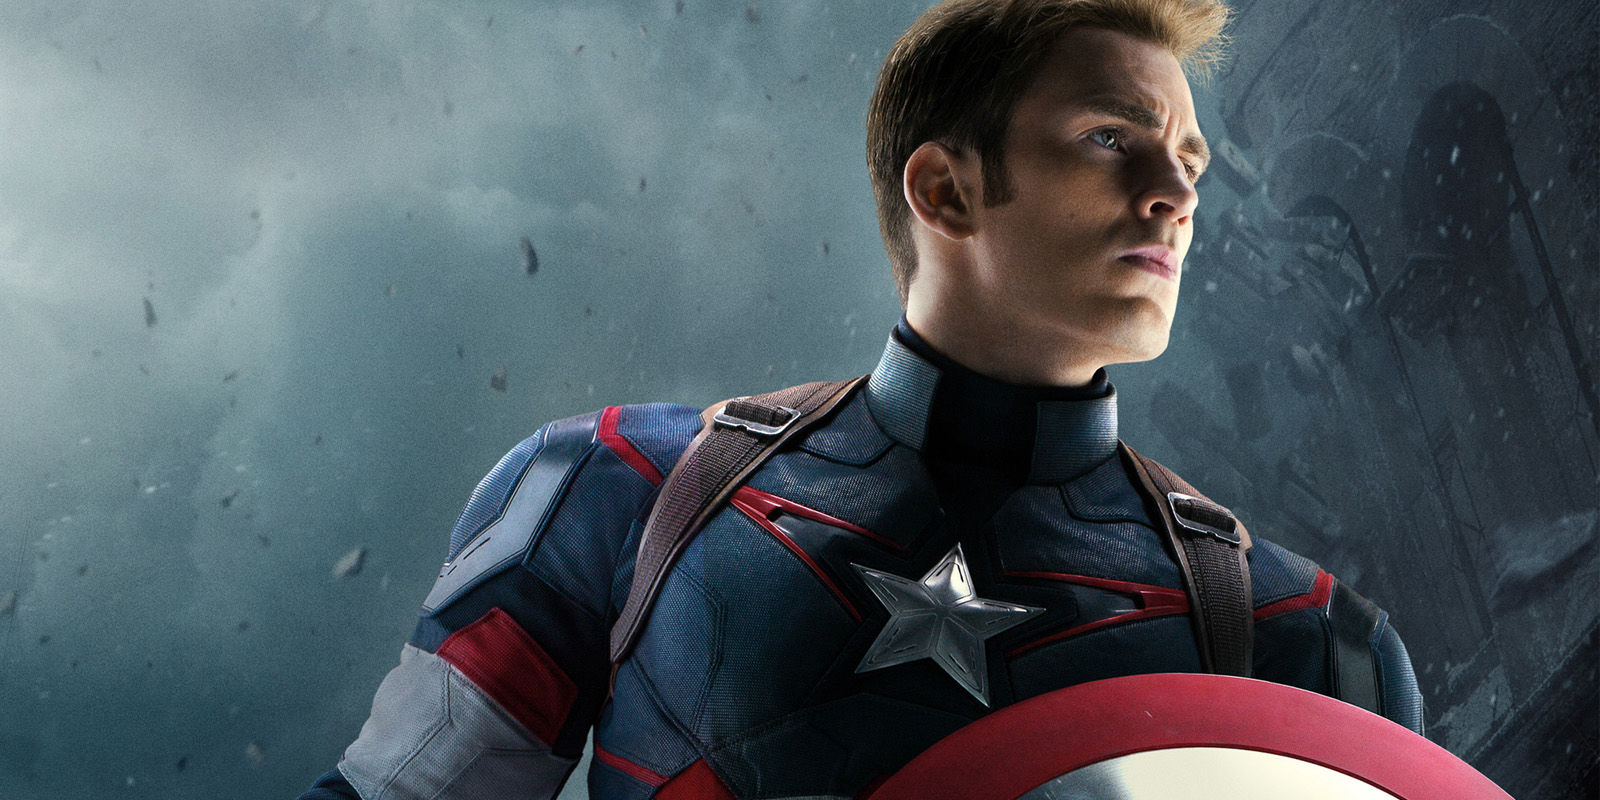 chris-evans-captain-america-avengers-contract